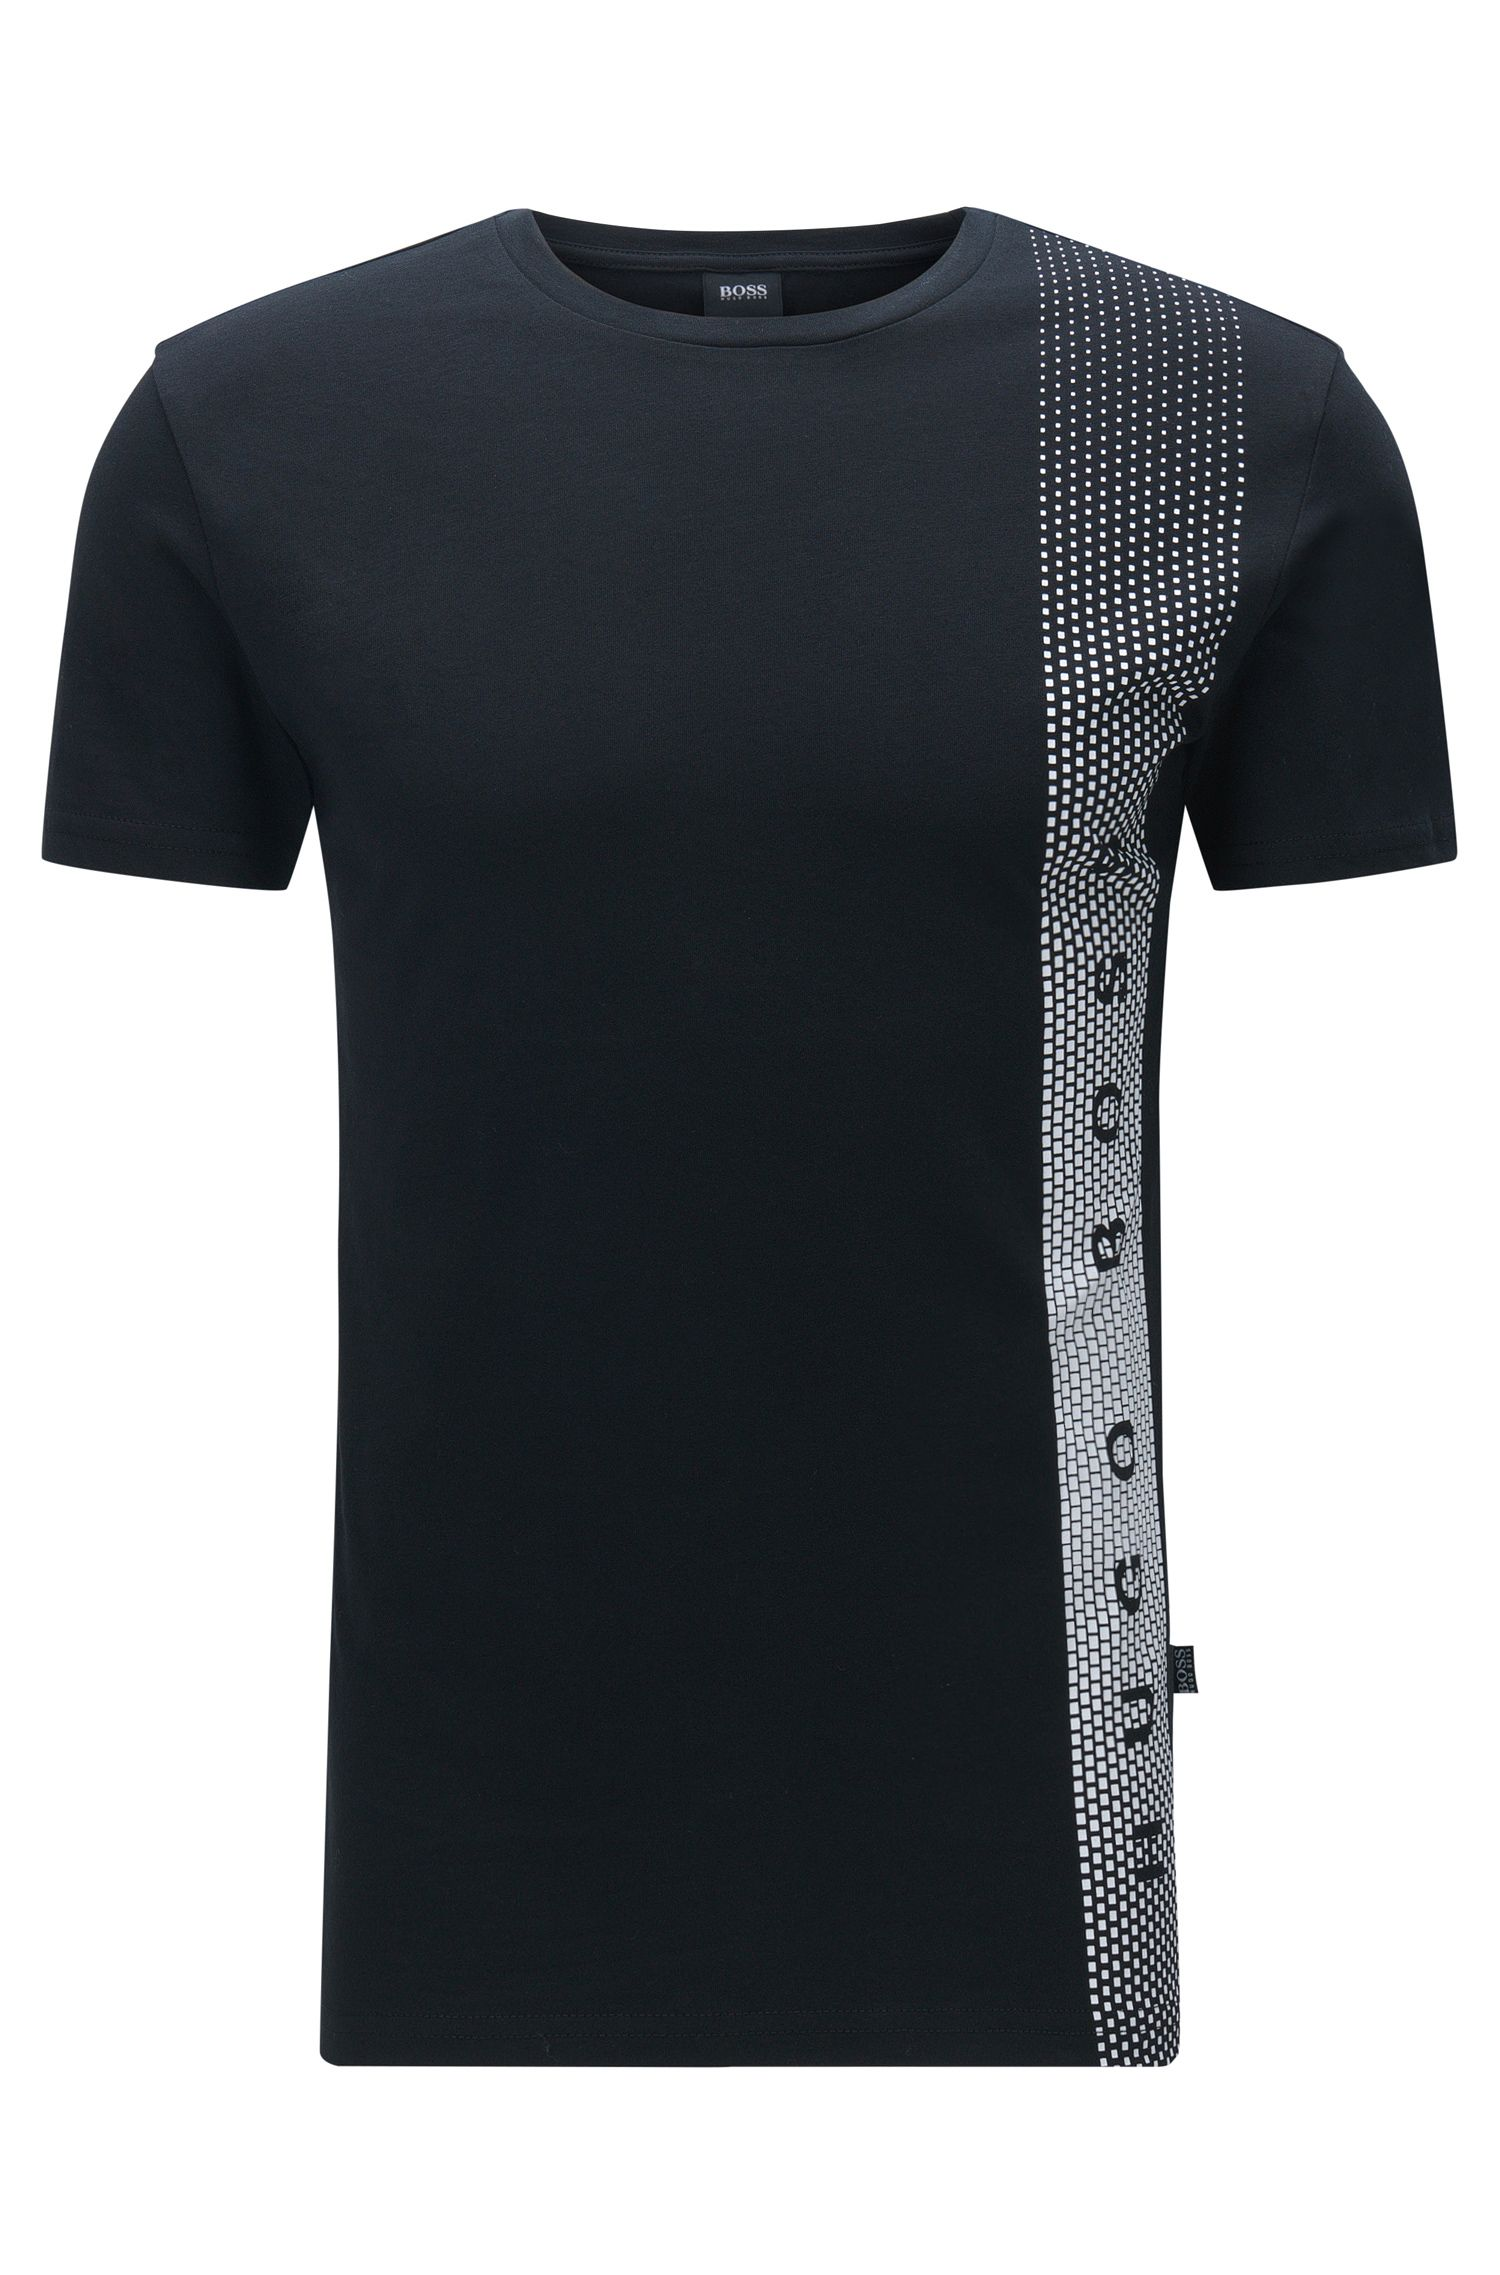 T-shirt Slim Fit en coton avec protection anti-UV: «T-Shirt RN»